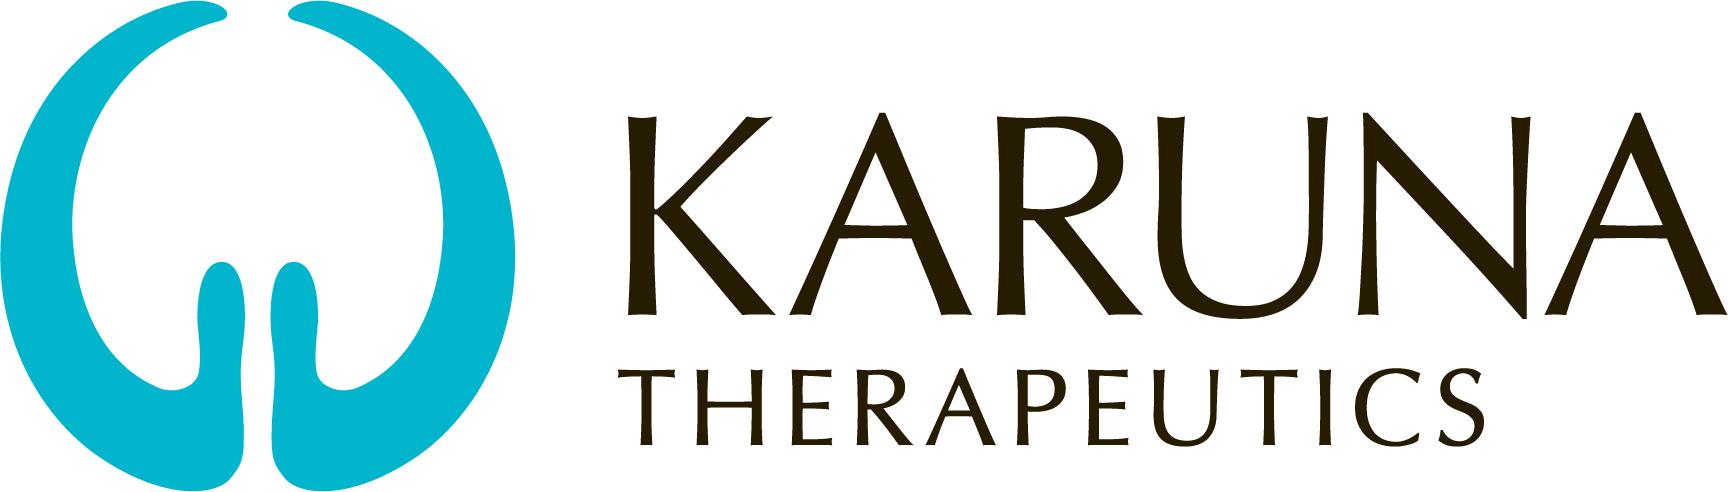 IPO Karuna Therapeutics